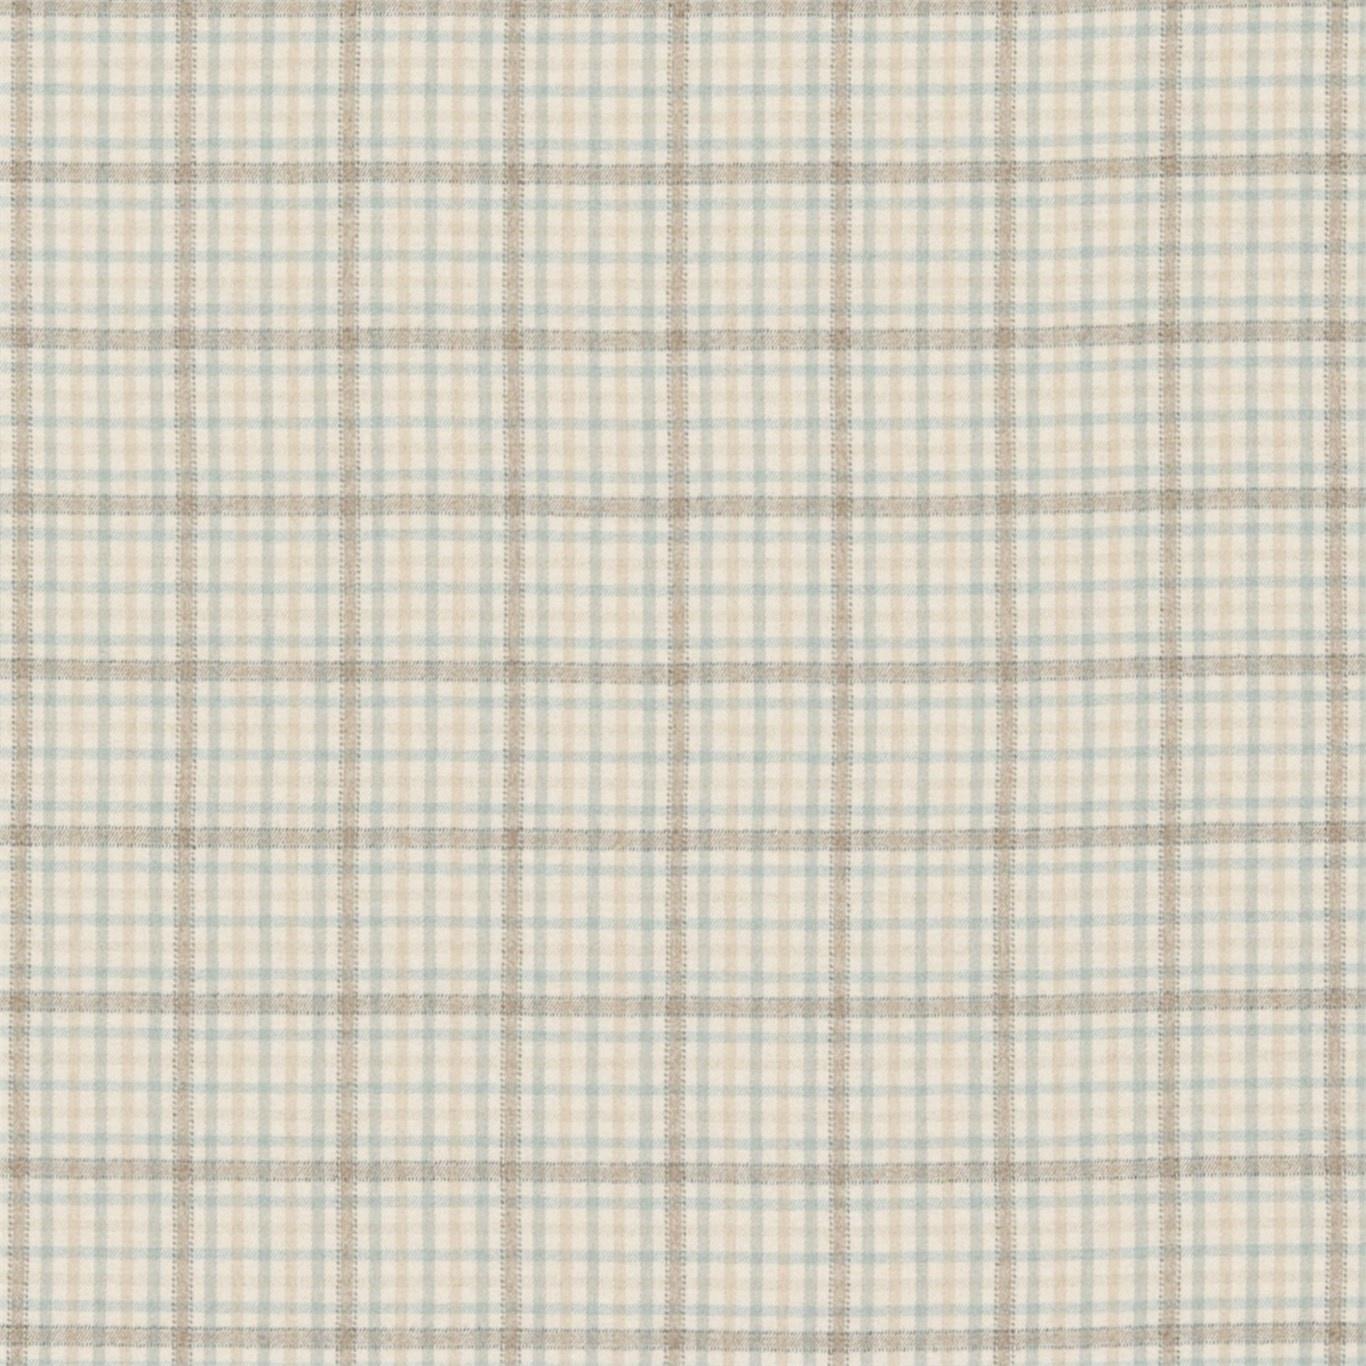 Image of Sanderson Langtry Eggshell/Cream Fabric 233261